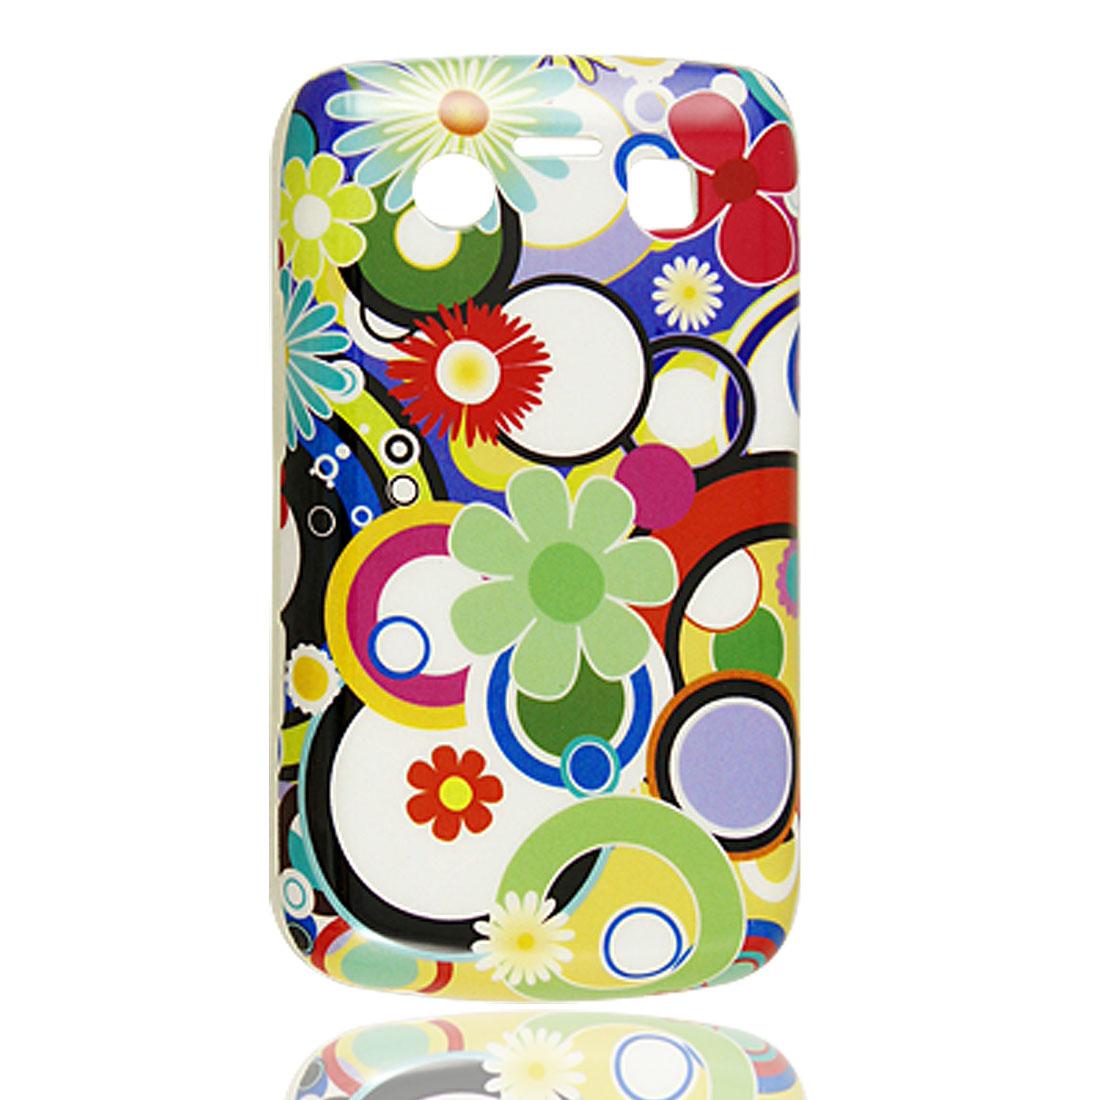 IMD Colorful Flower Printed Hard Plastic Case for Blackberry 9700 9020